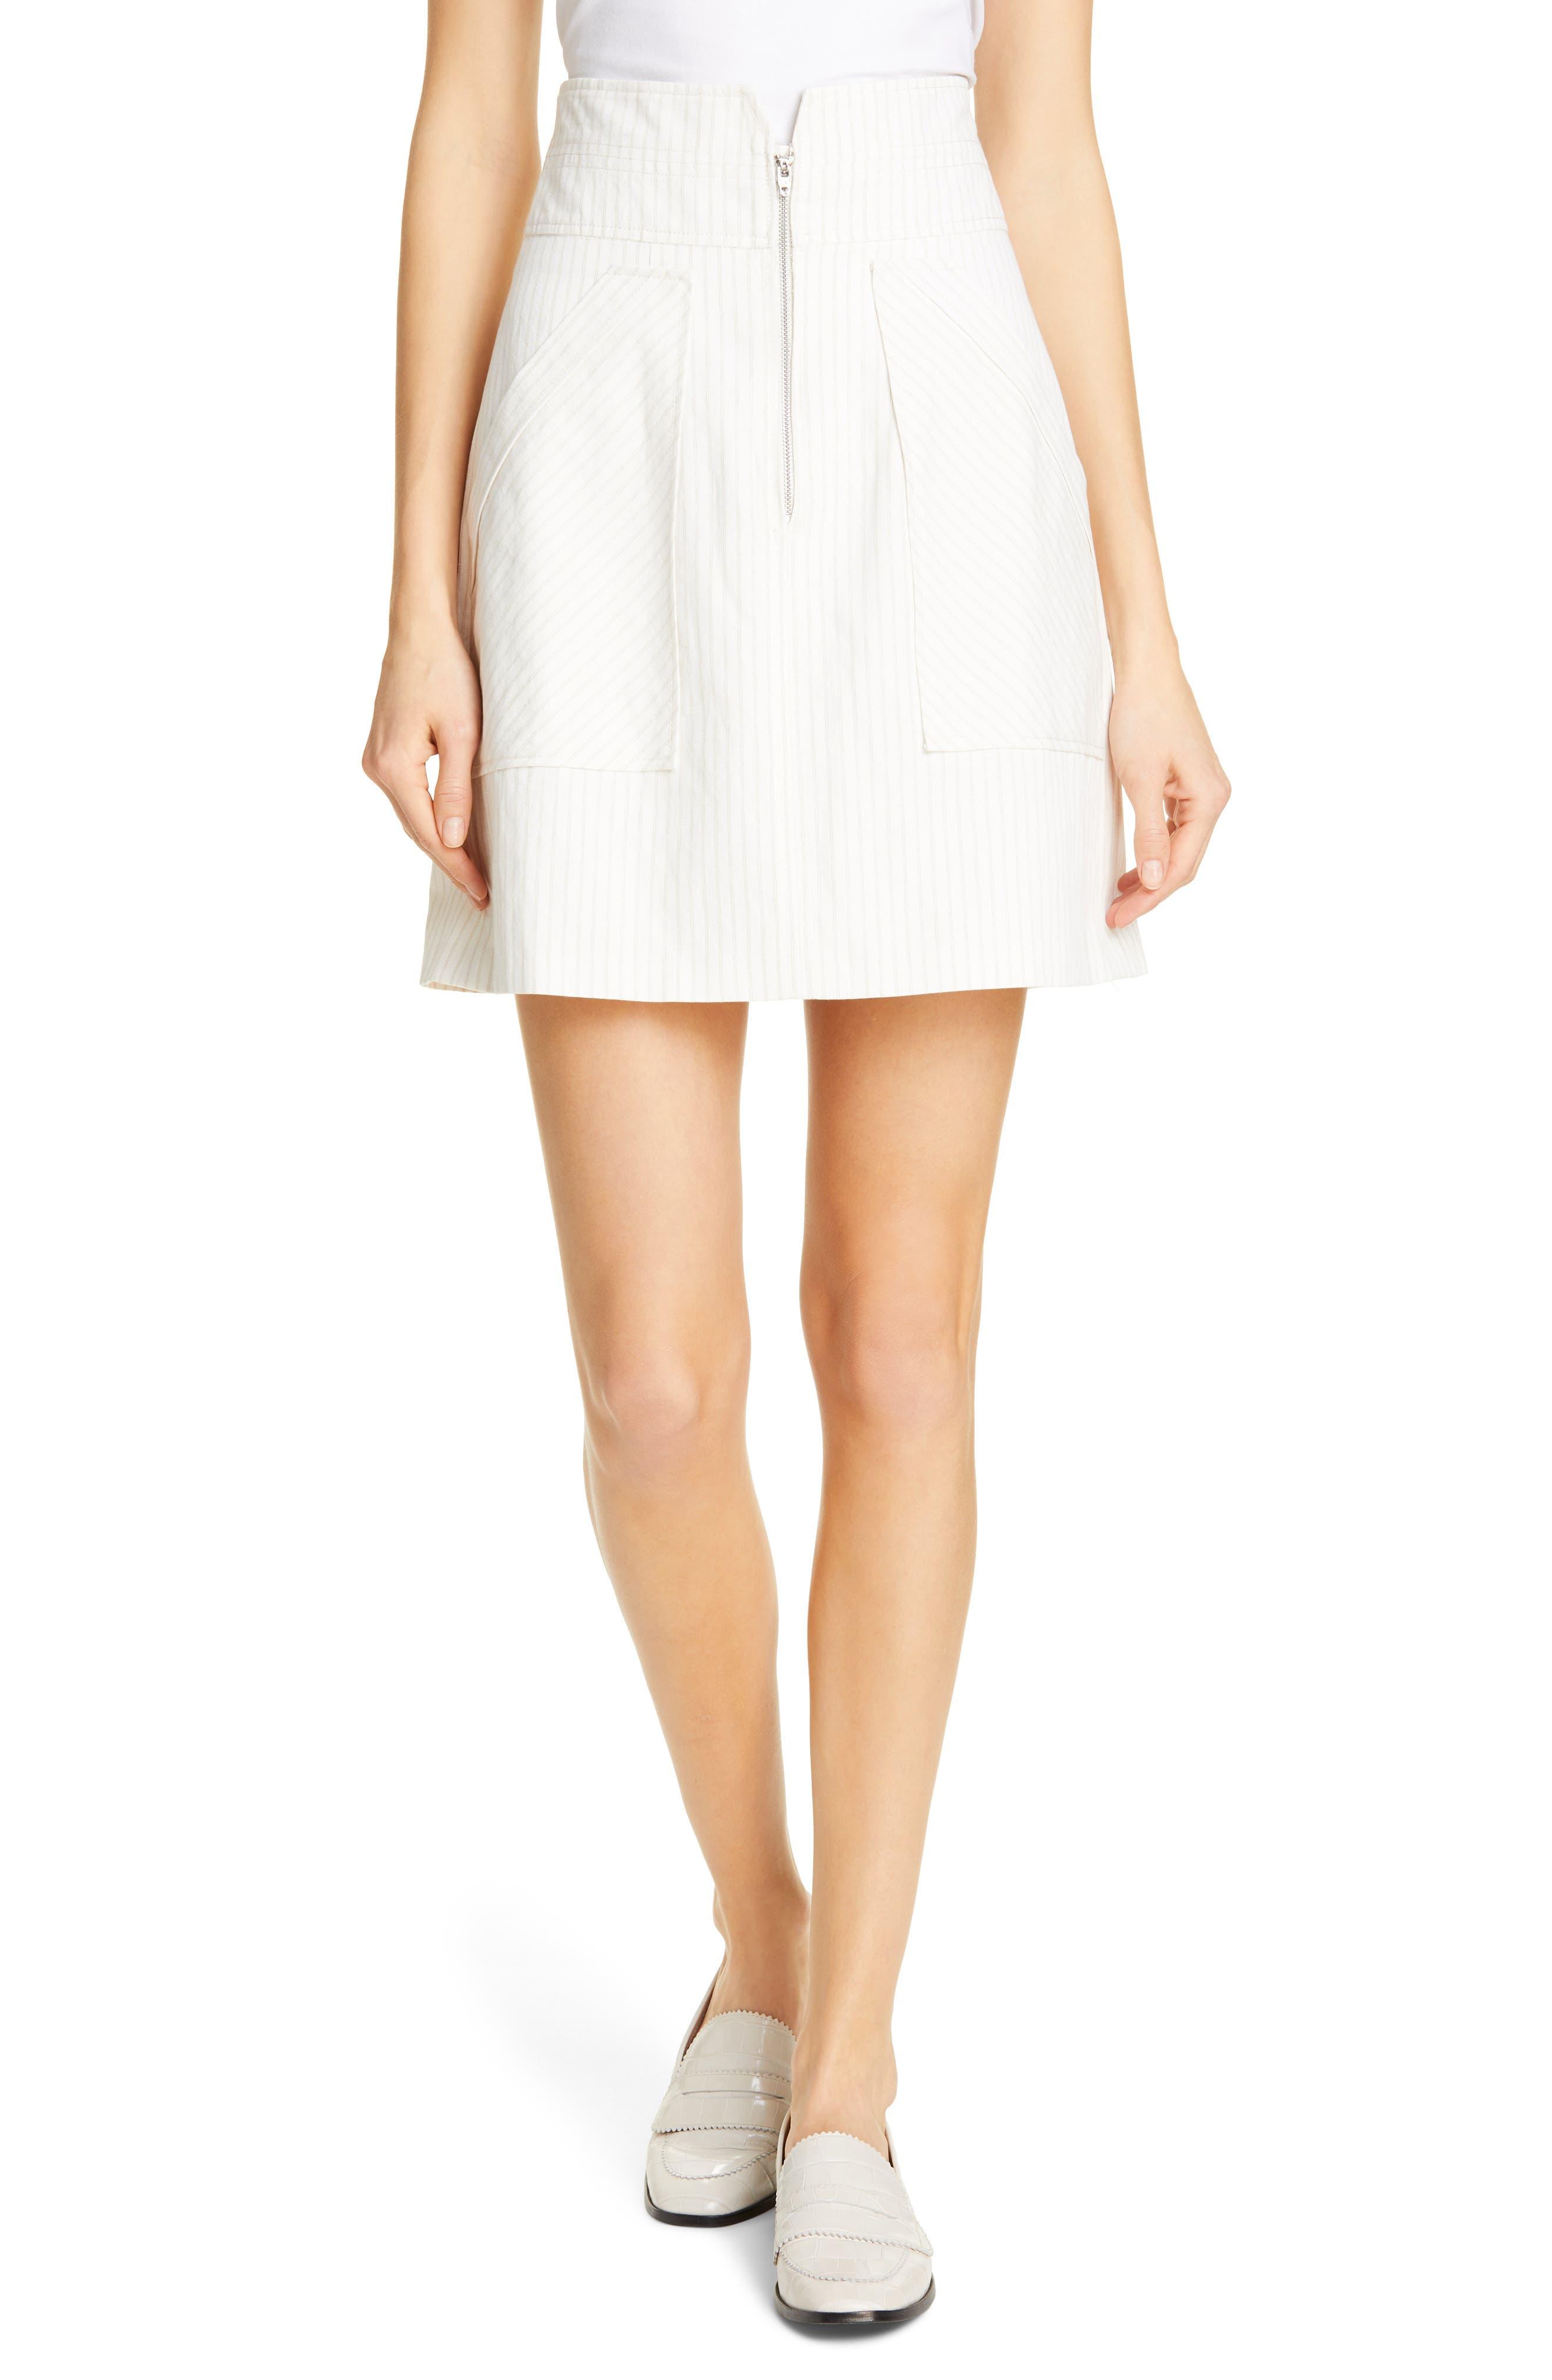 REBECCA TAYLOR, Zip Front Pinstripe Cotton & Linen Skirt, Main thumbnail 1, color, SNOW COMBO